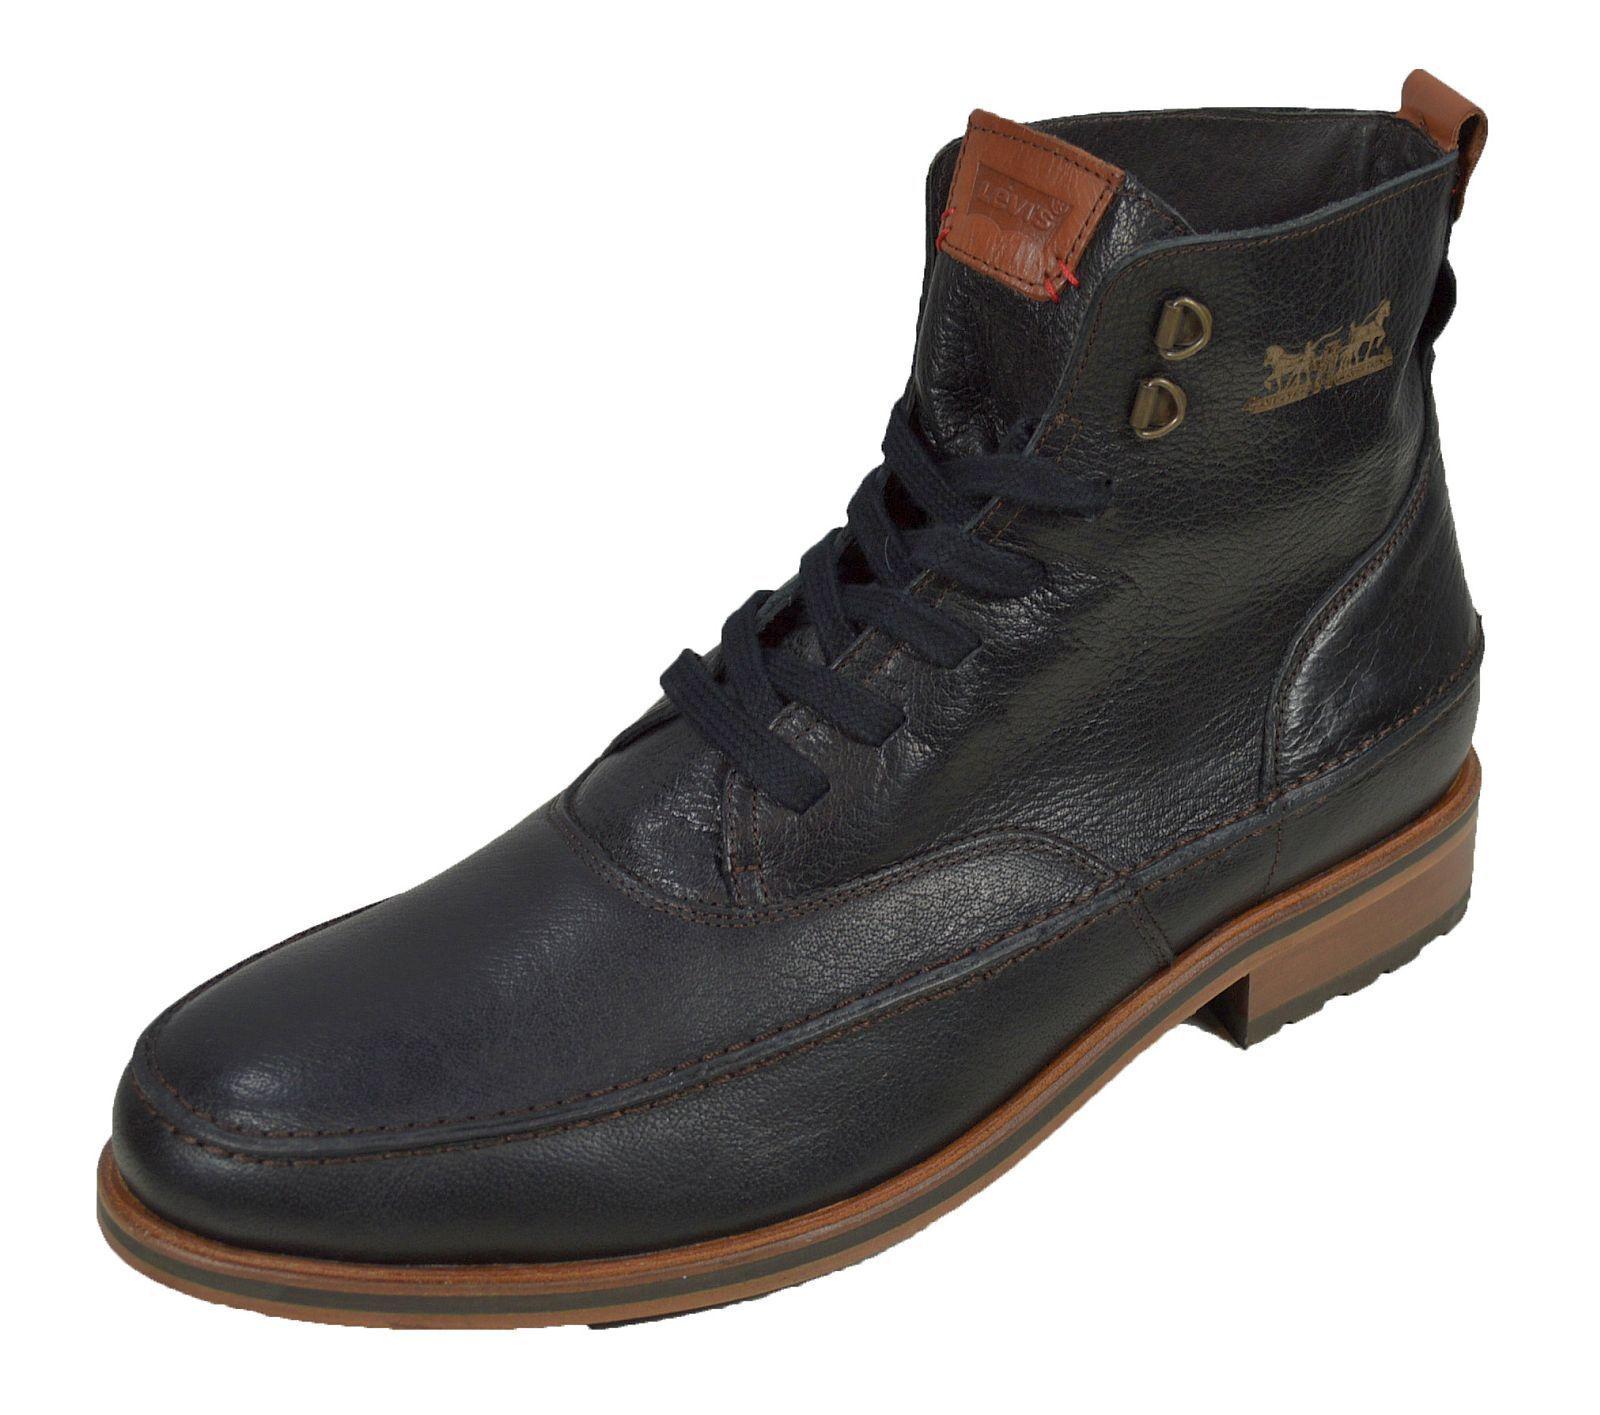 Levis Herren Leder Stiefel Schuhe Schwarz Herren Schuhe sale 10121500